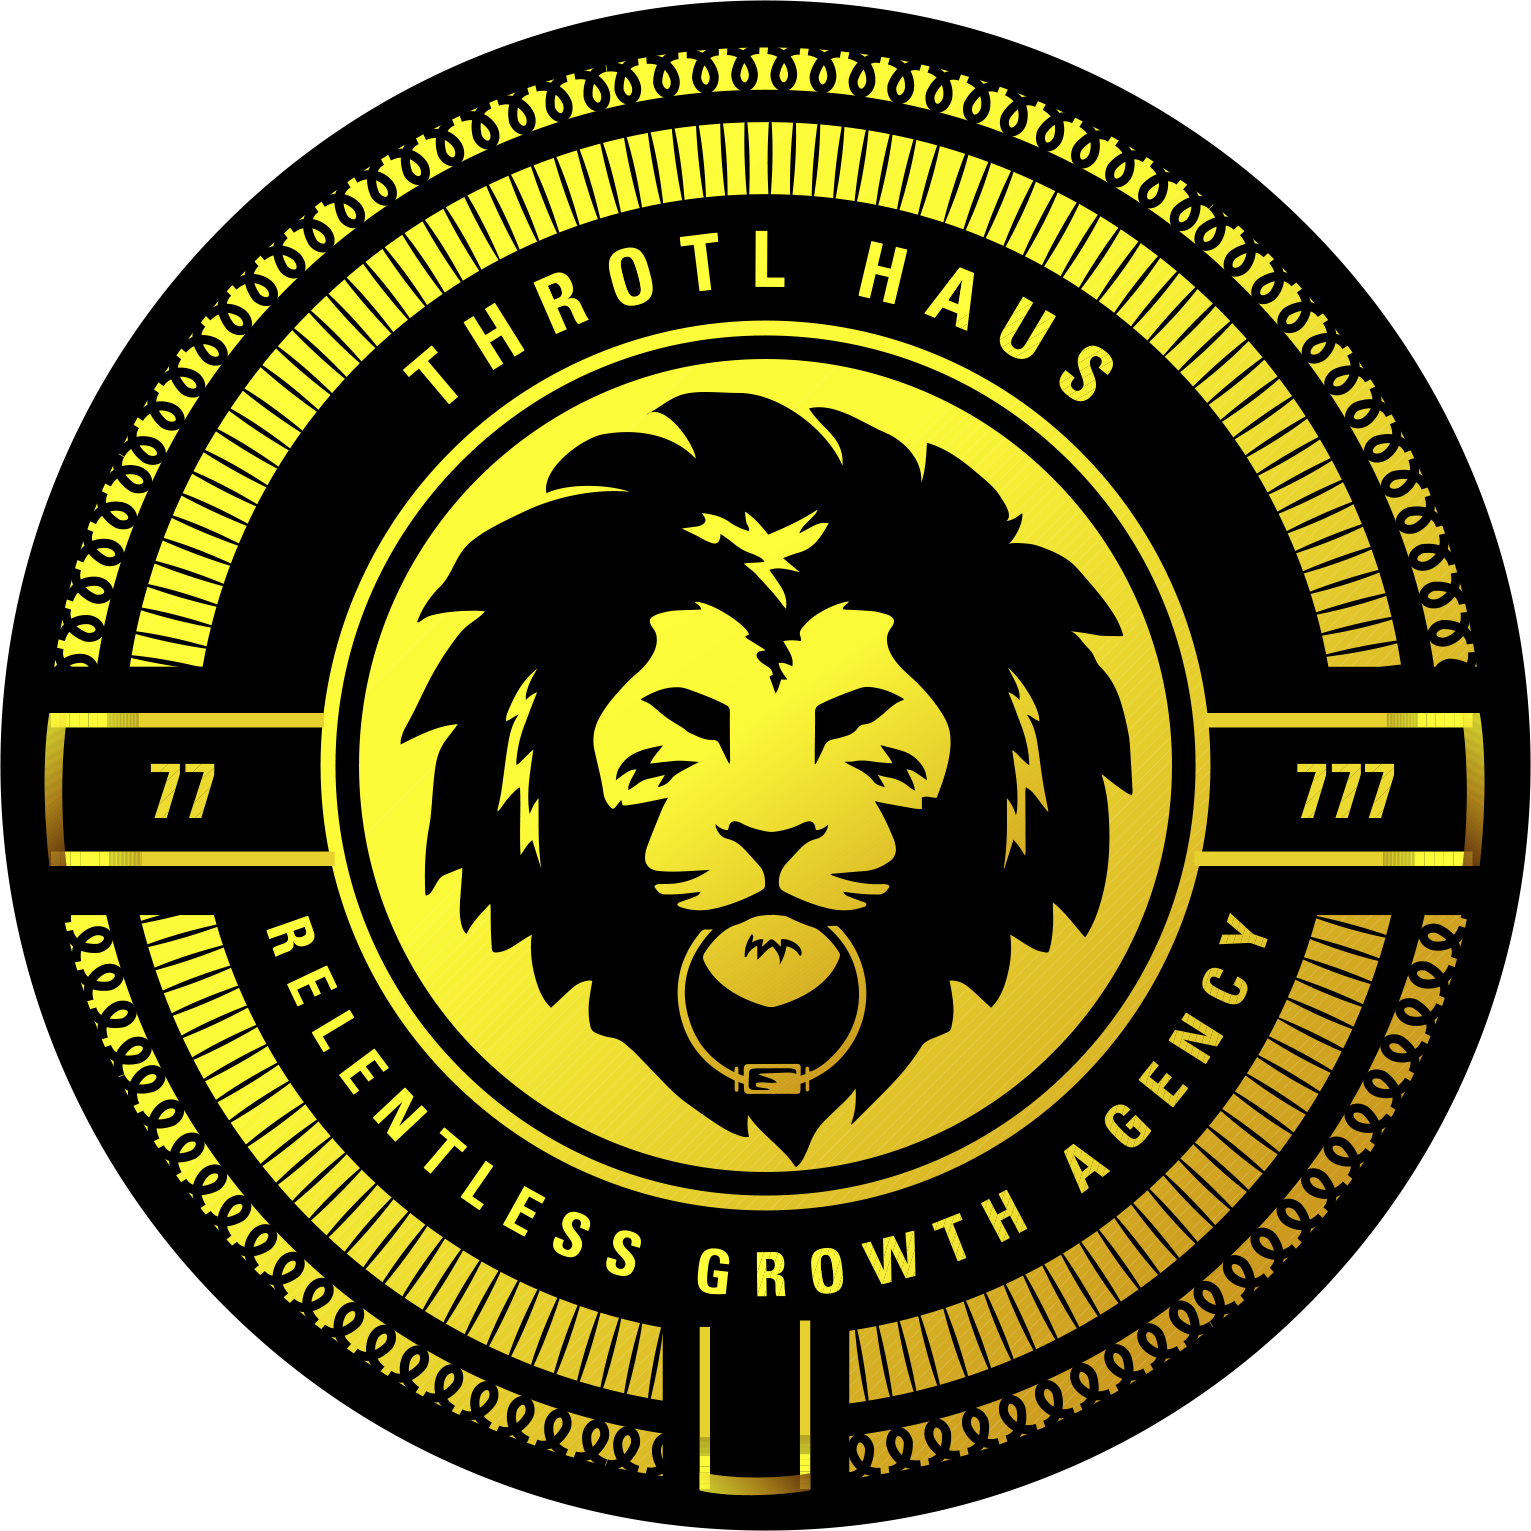 THROTL HAUS